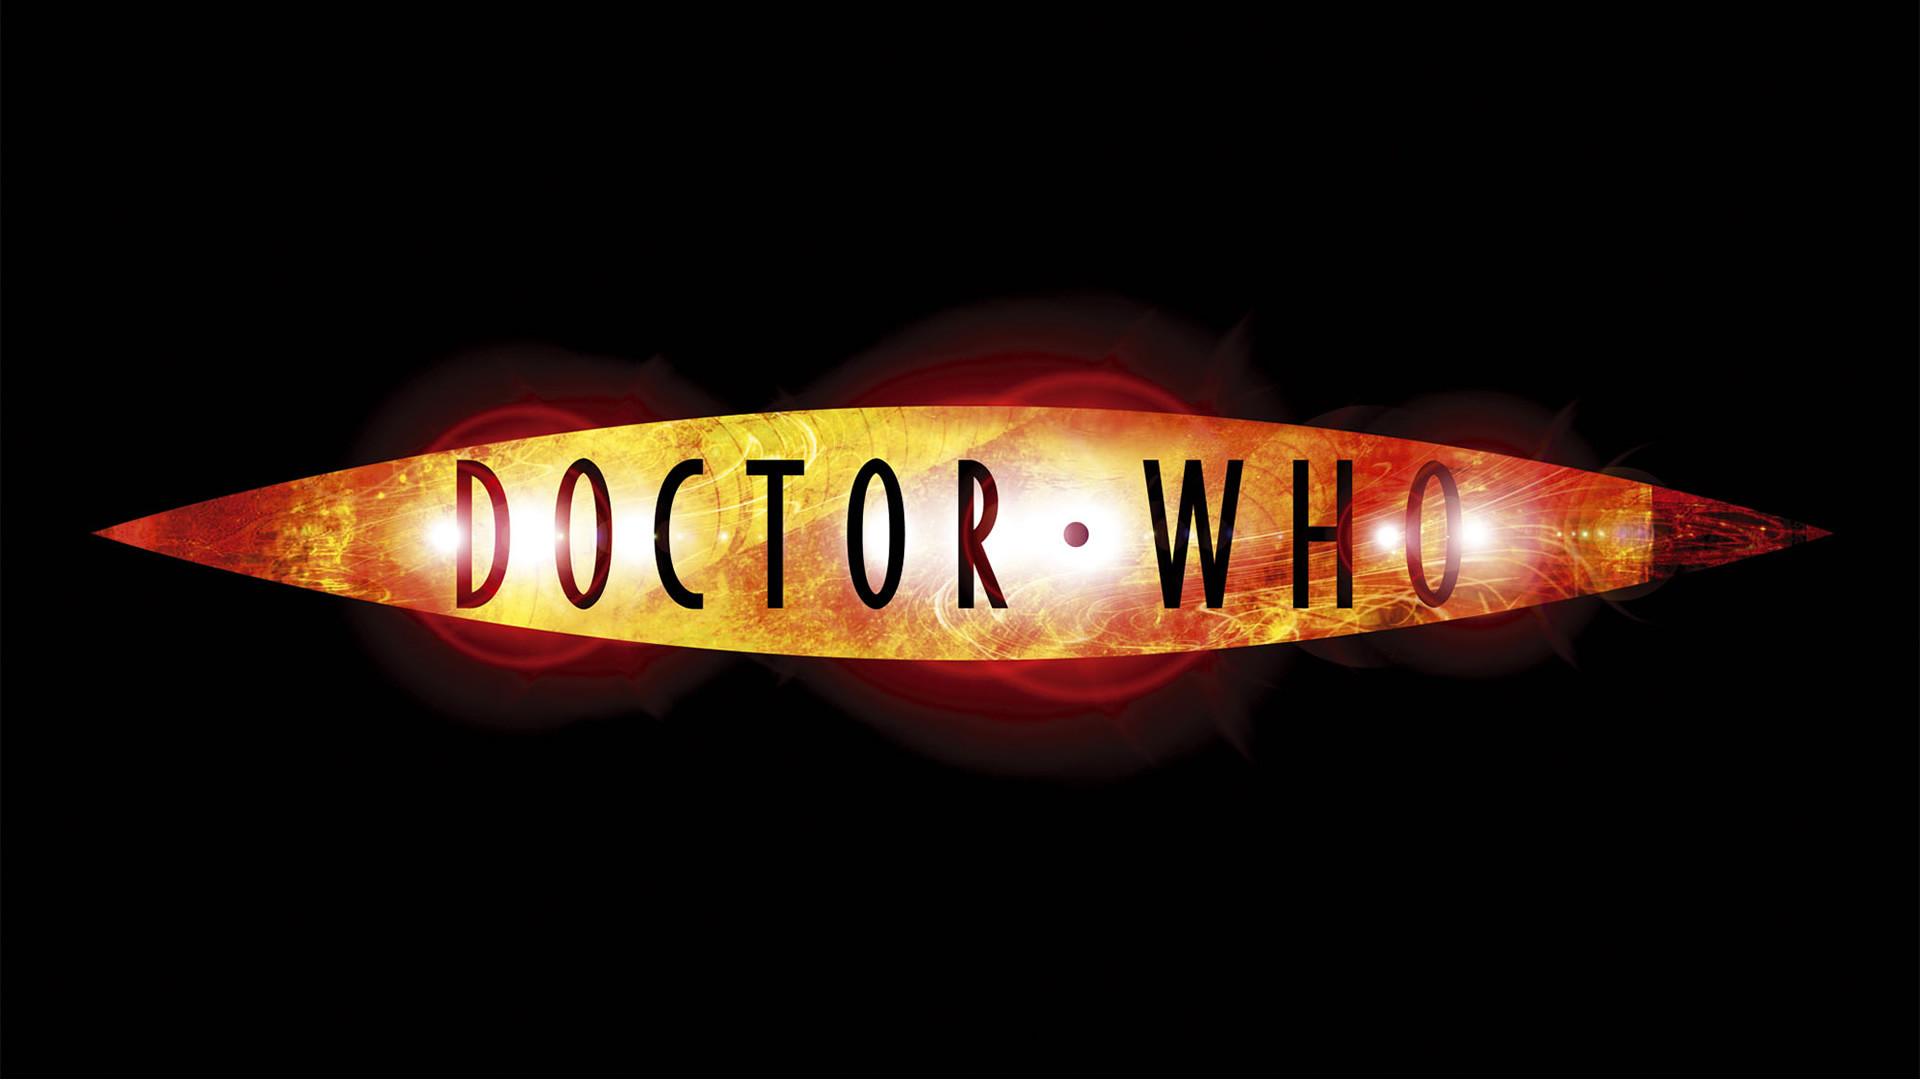 Doctor Who Logo HD Wallpaper. « »